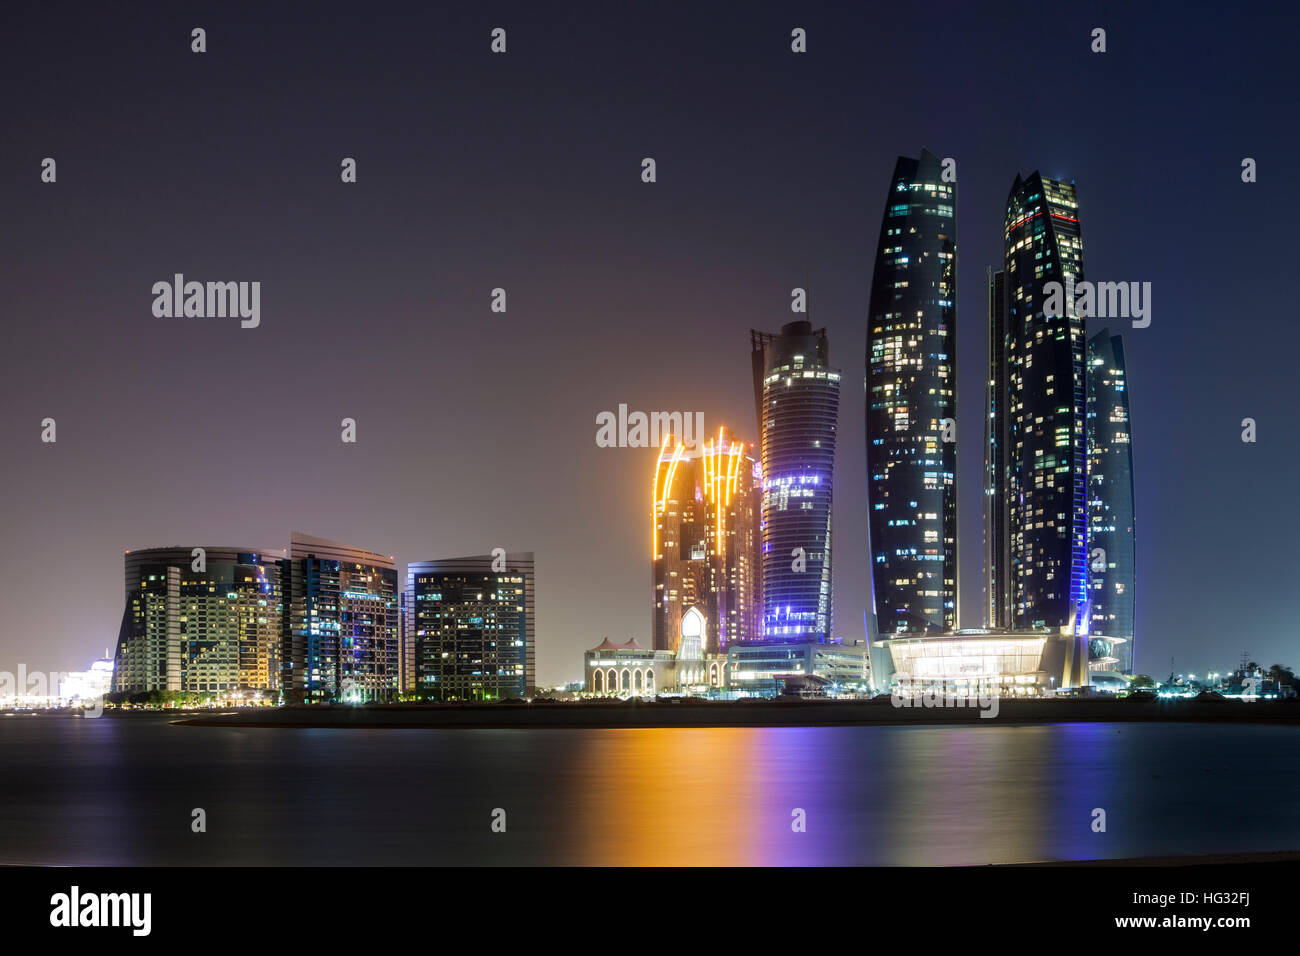 The Etihad Towers in Abu Dhabi illuminated at night - Stock Image